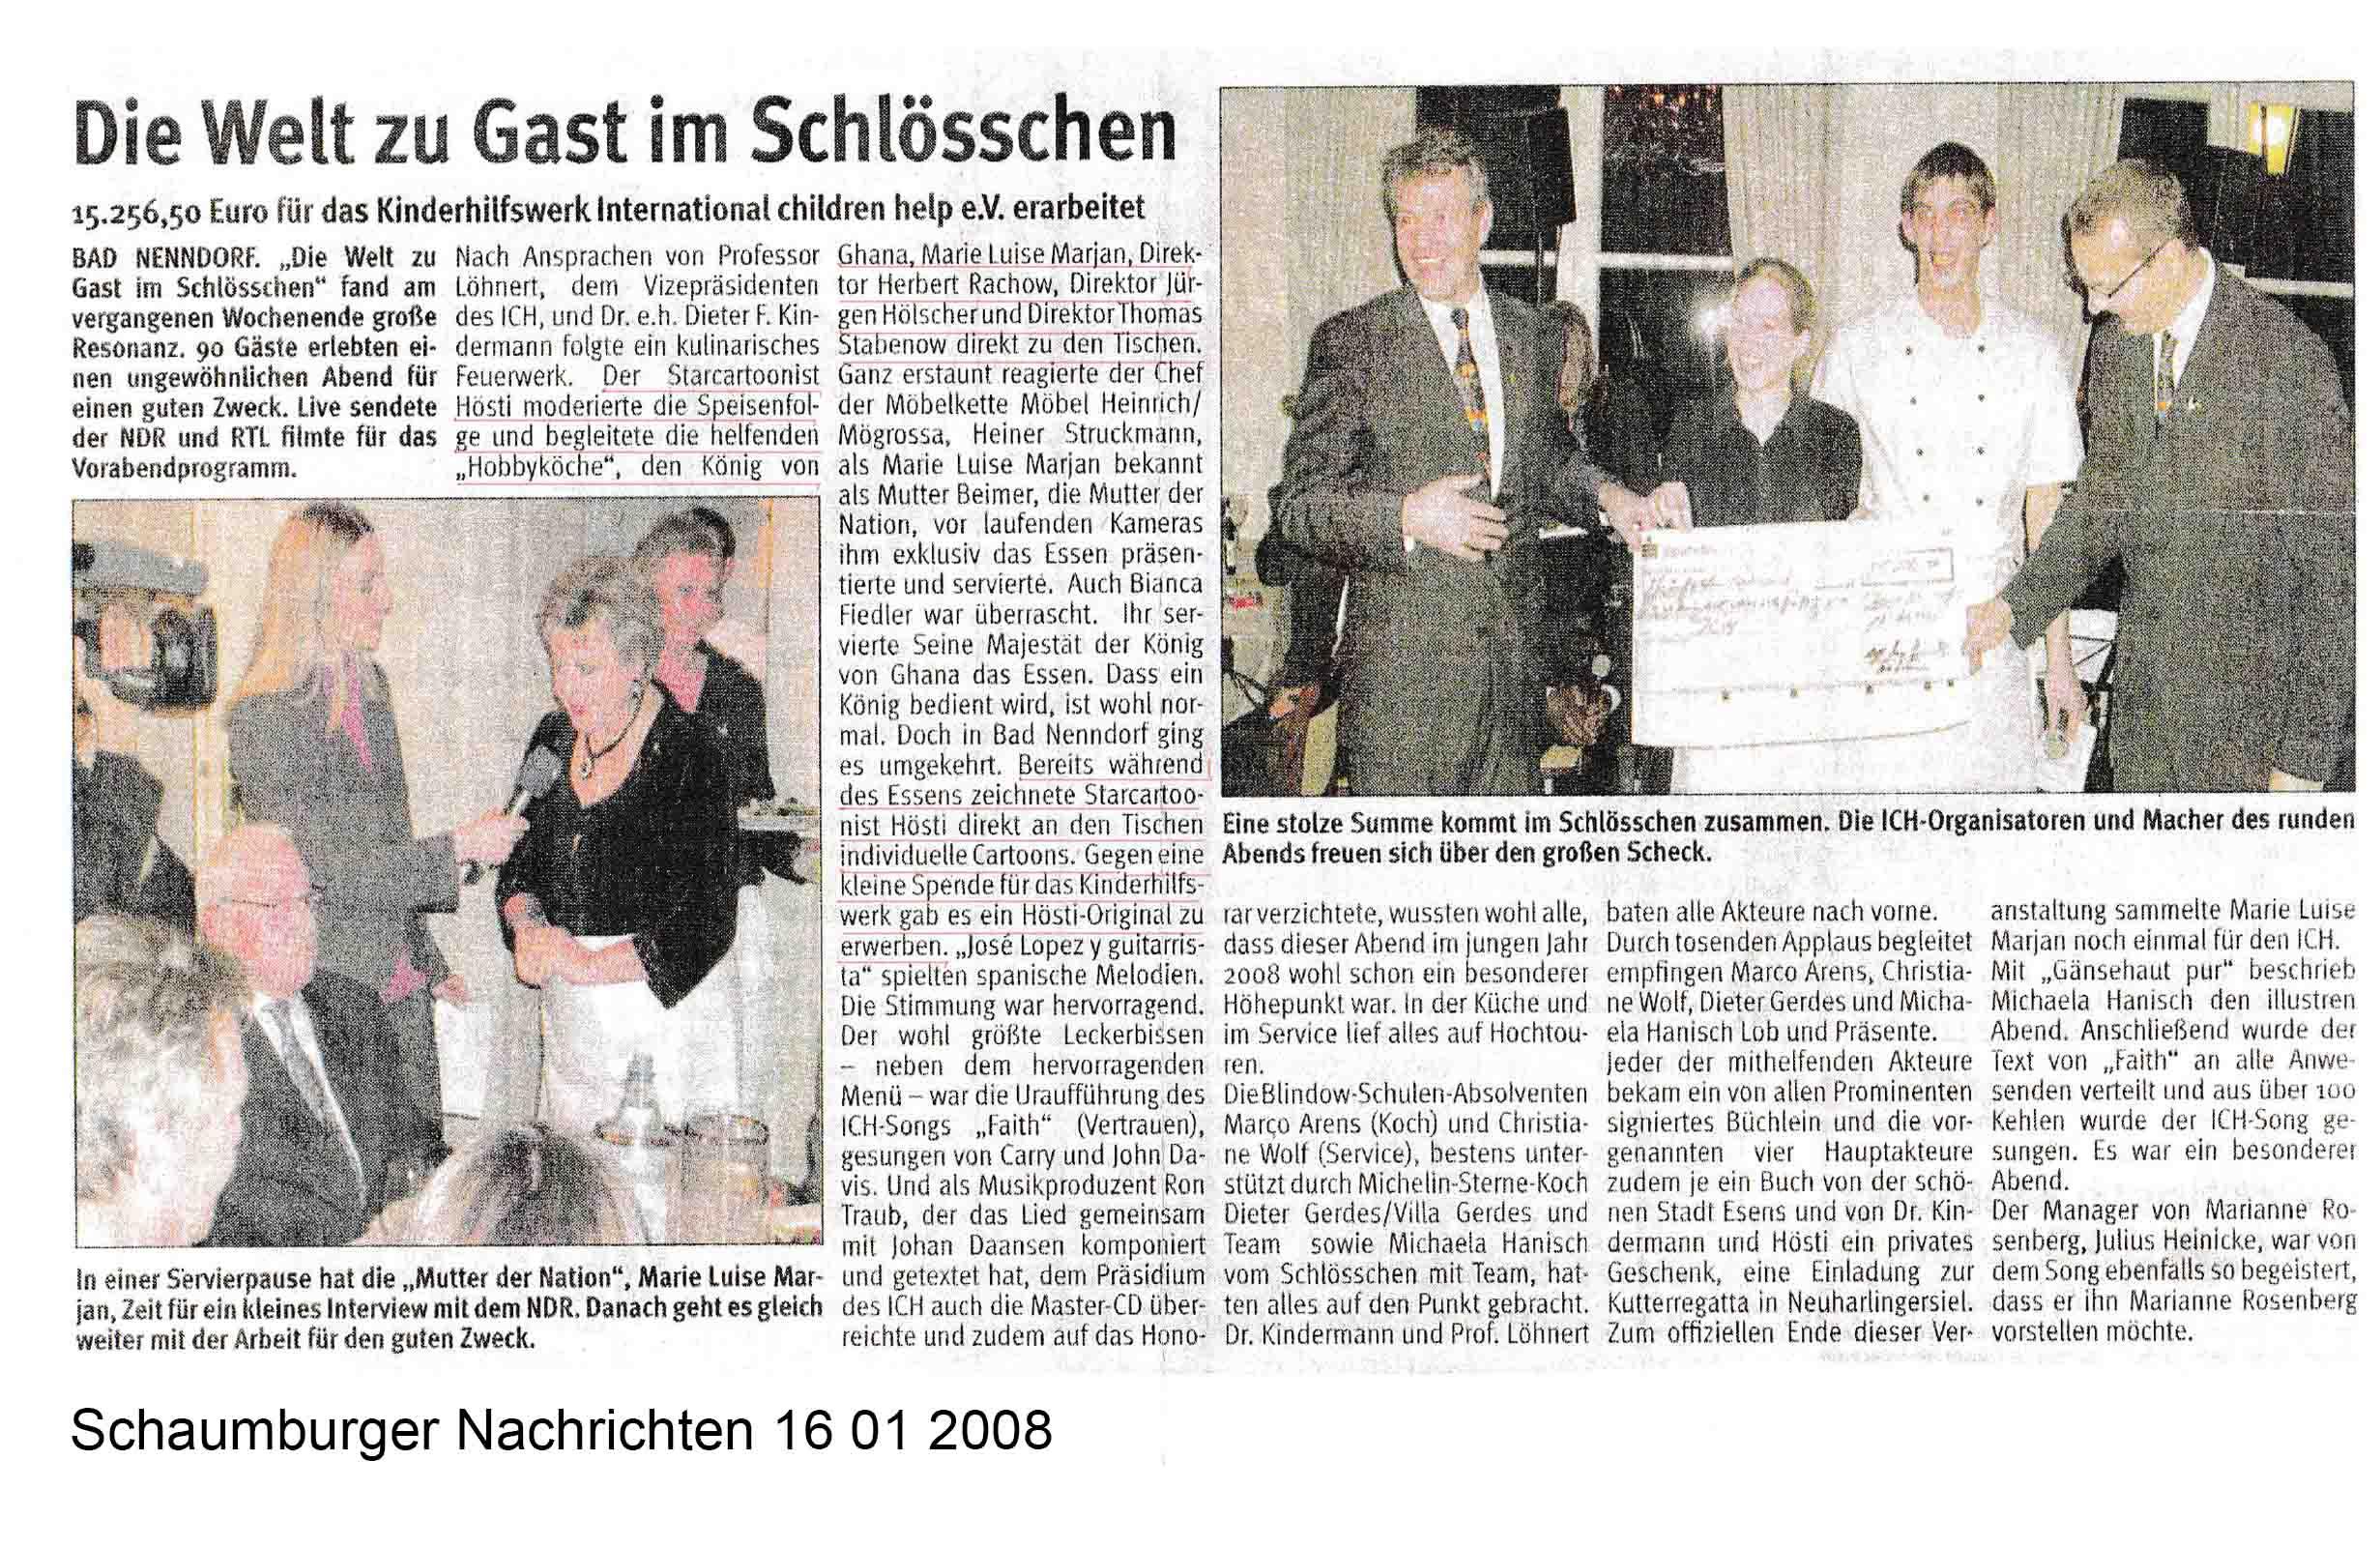 Schaumburger Nachrichten 16 01 2008